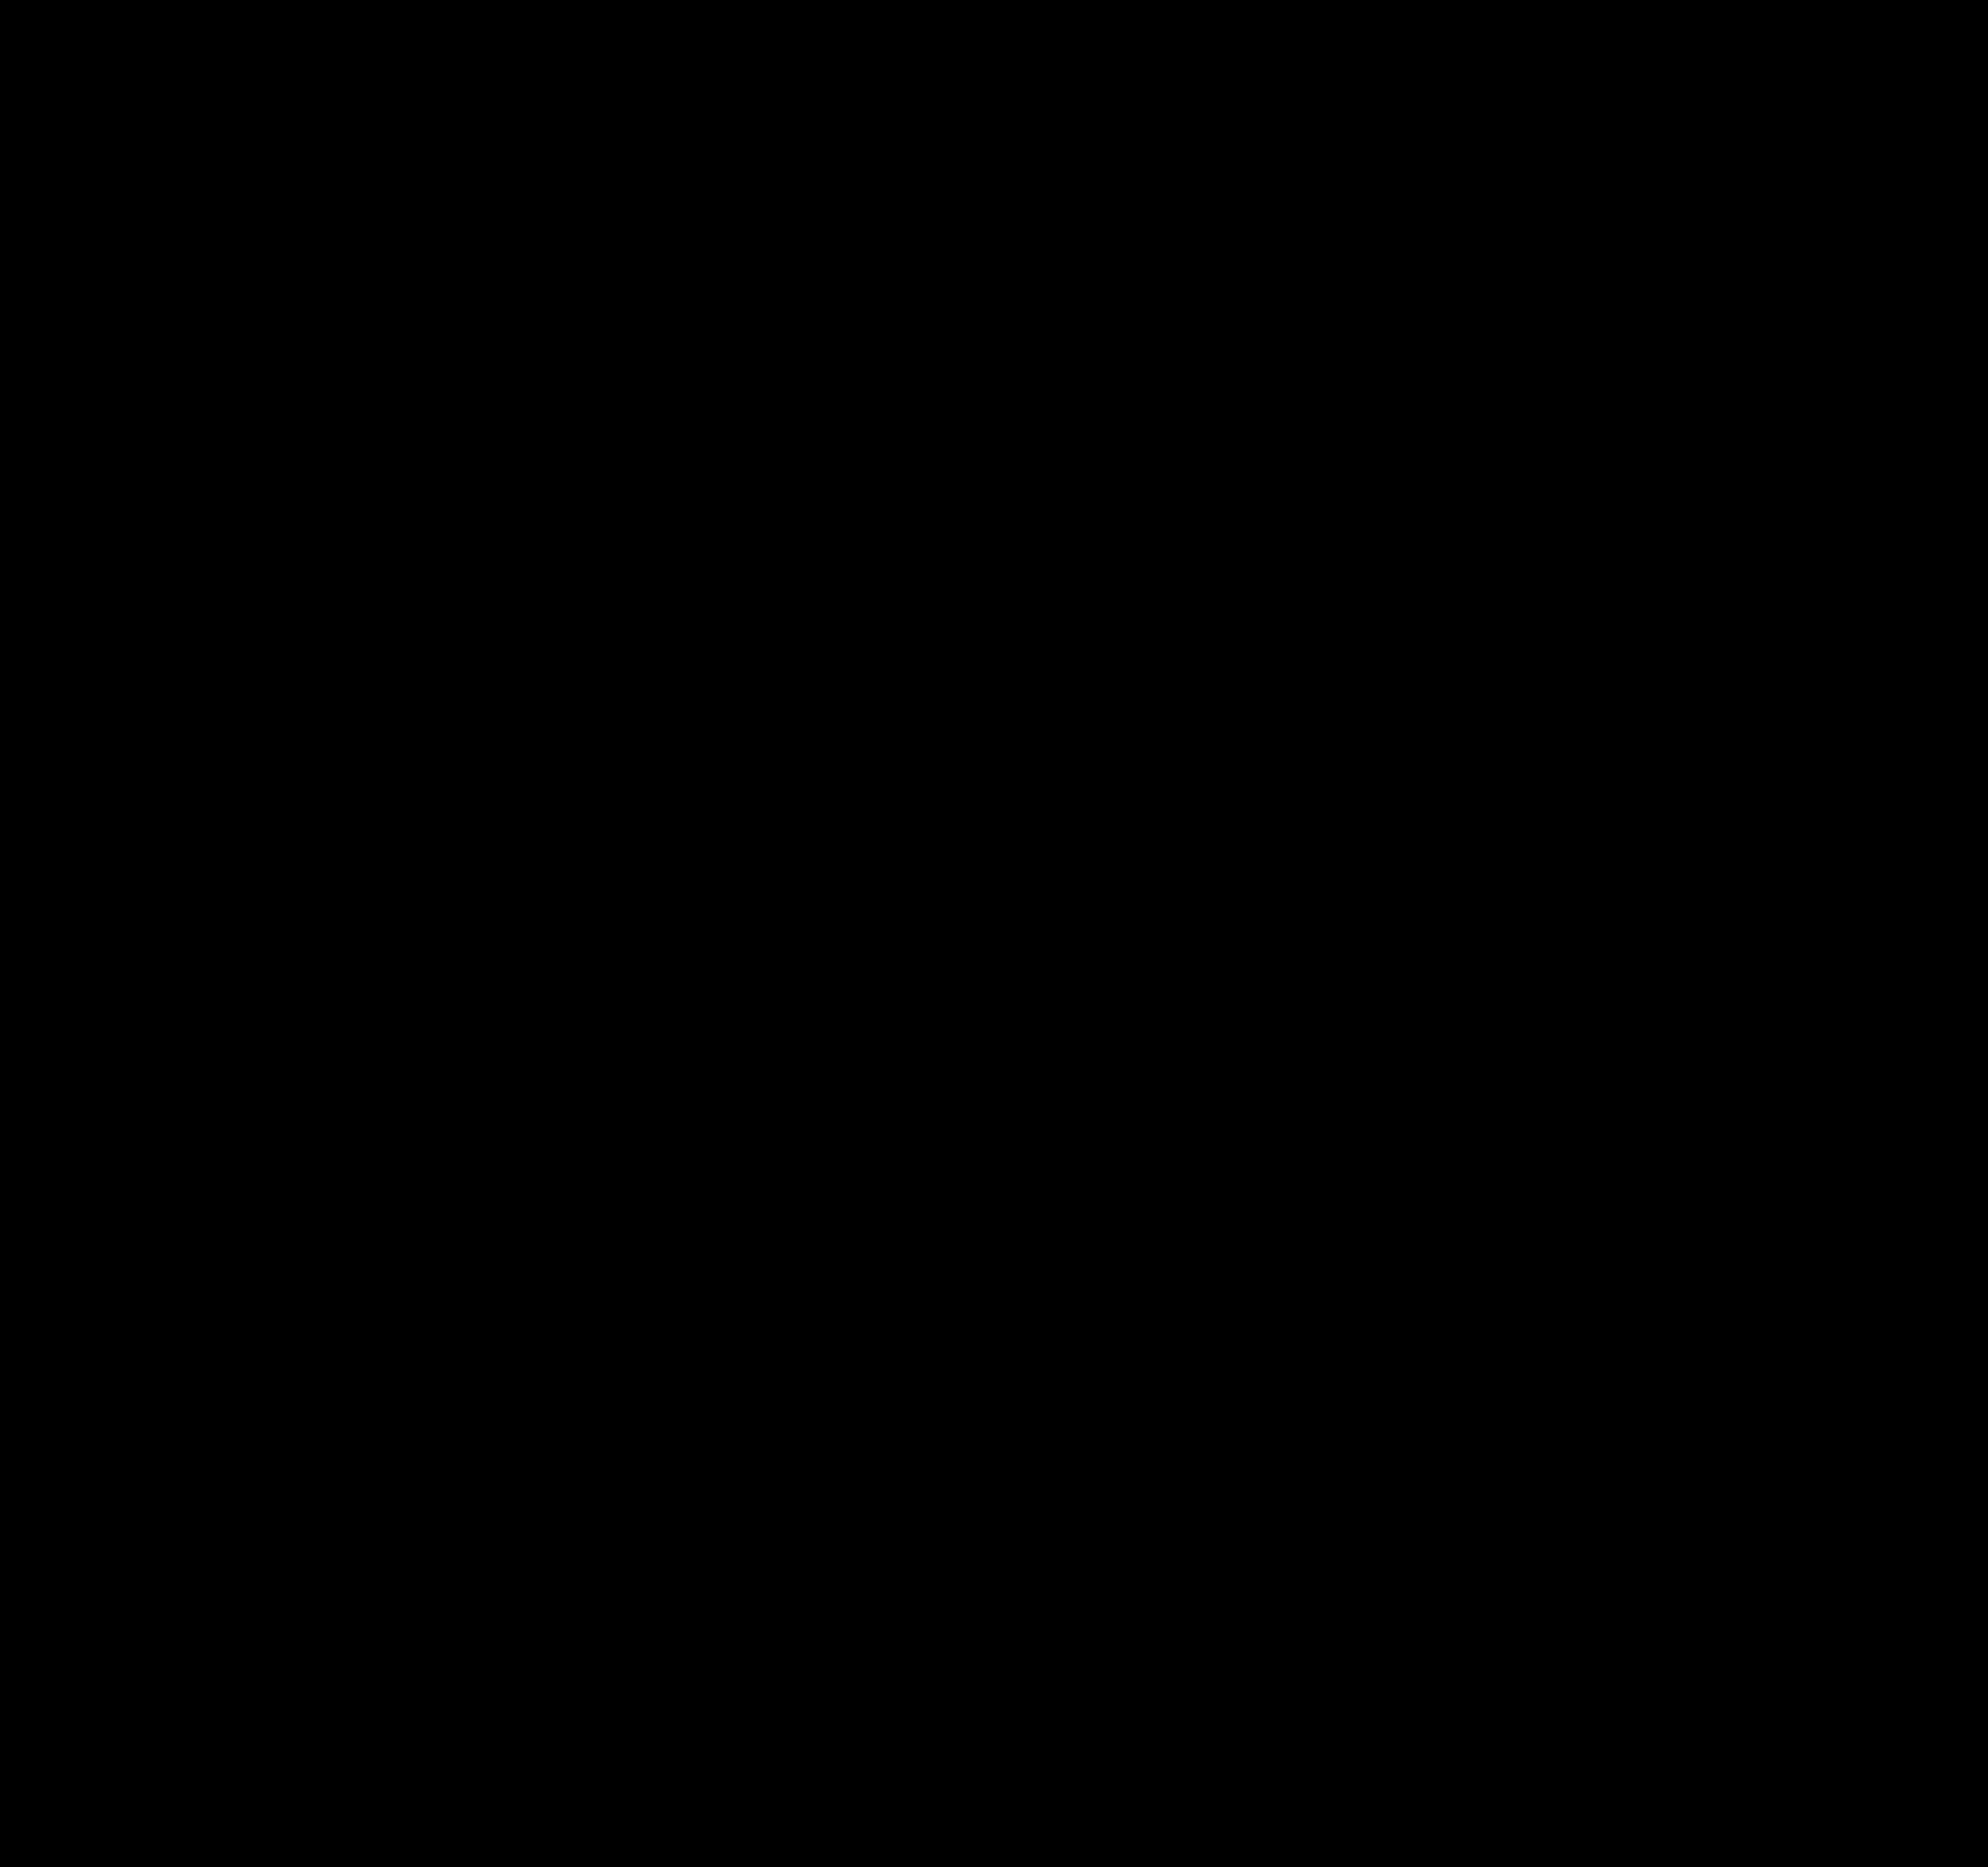 2324x2182 Cozy Design Unicorn Black And White Leaf Template 10 Silhouette